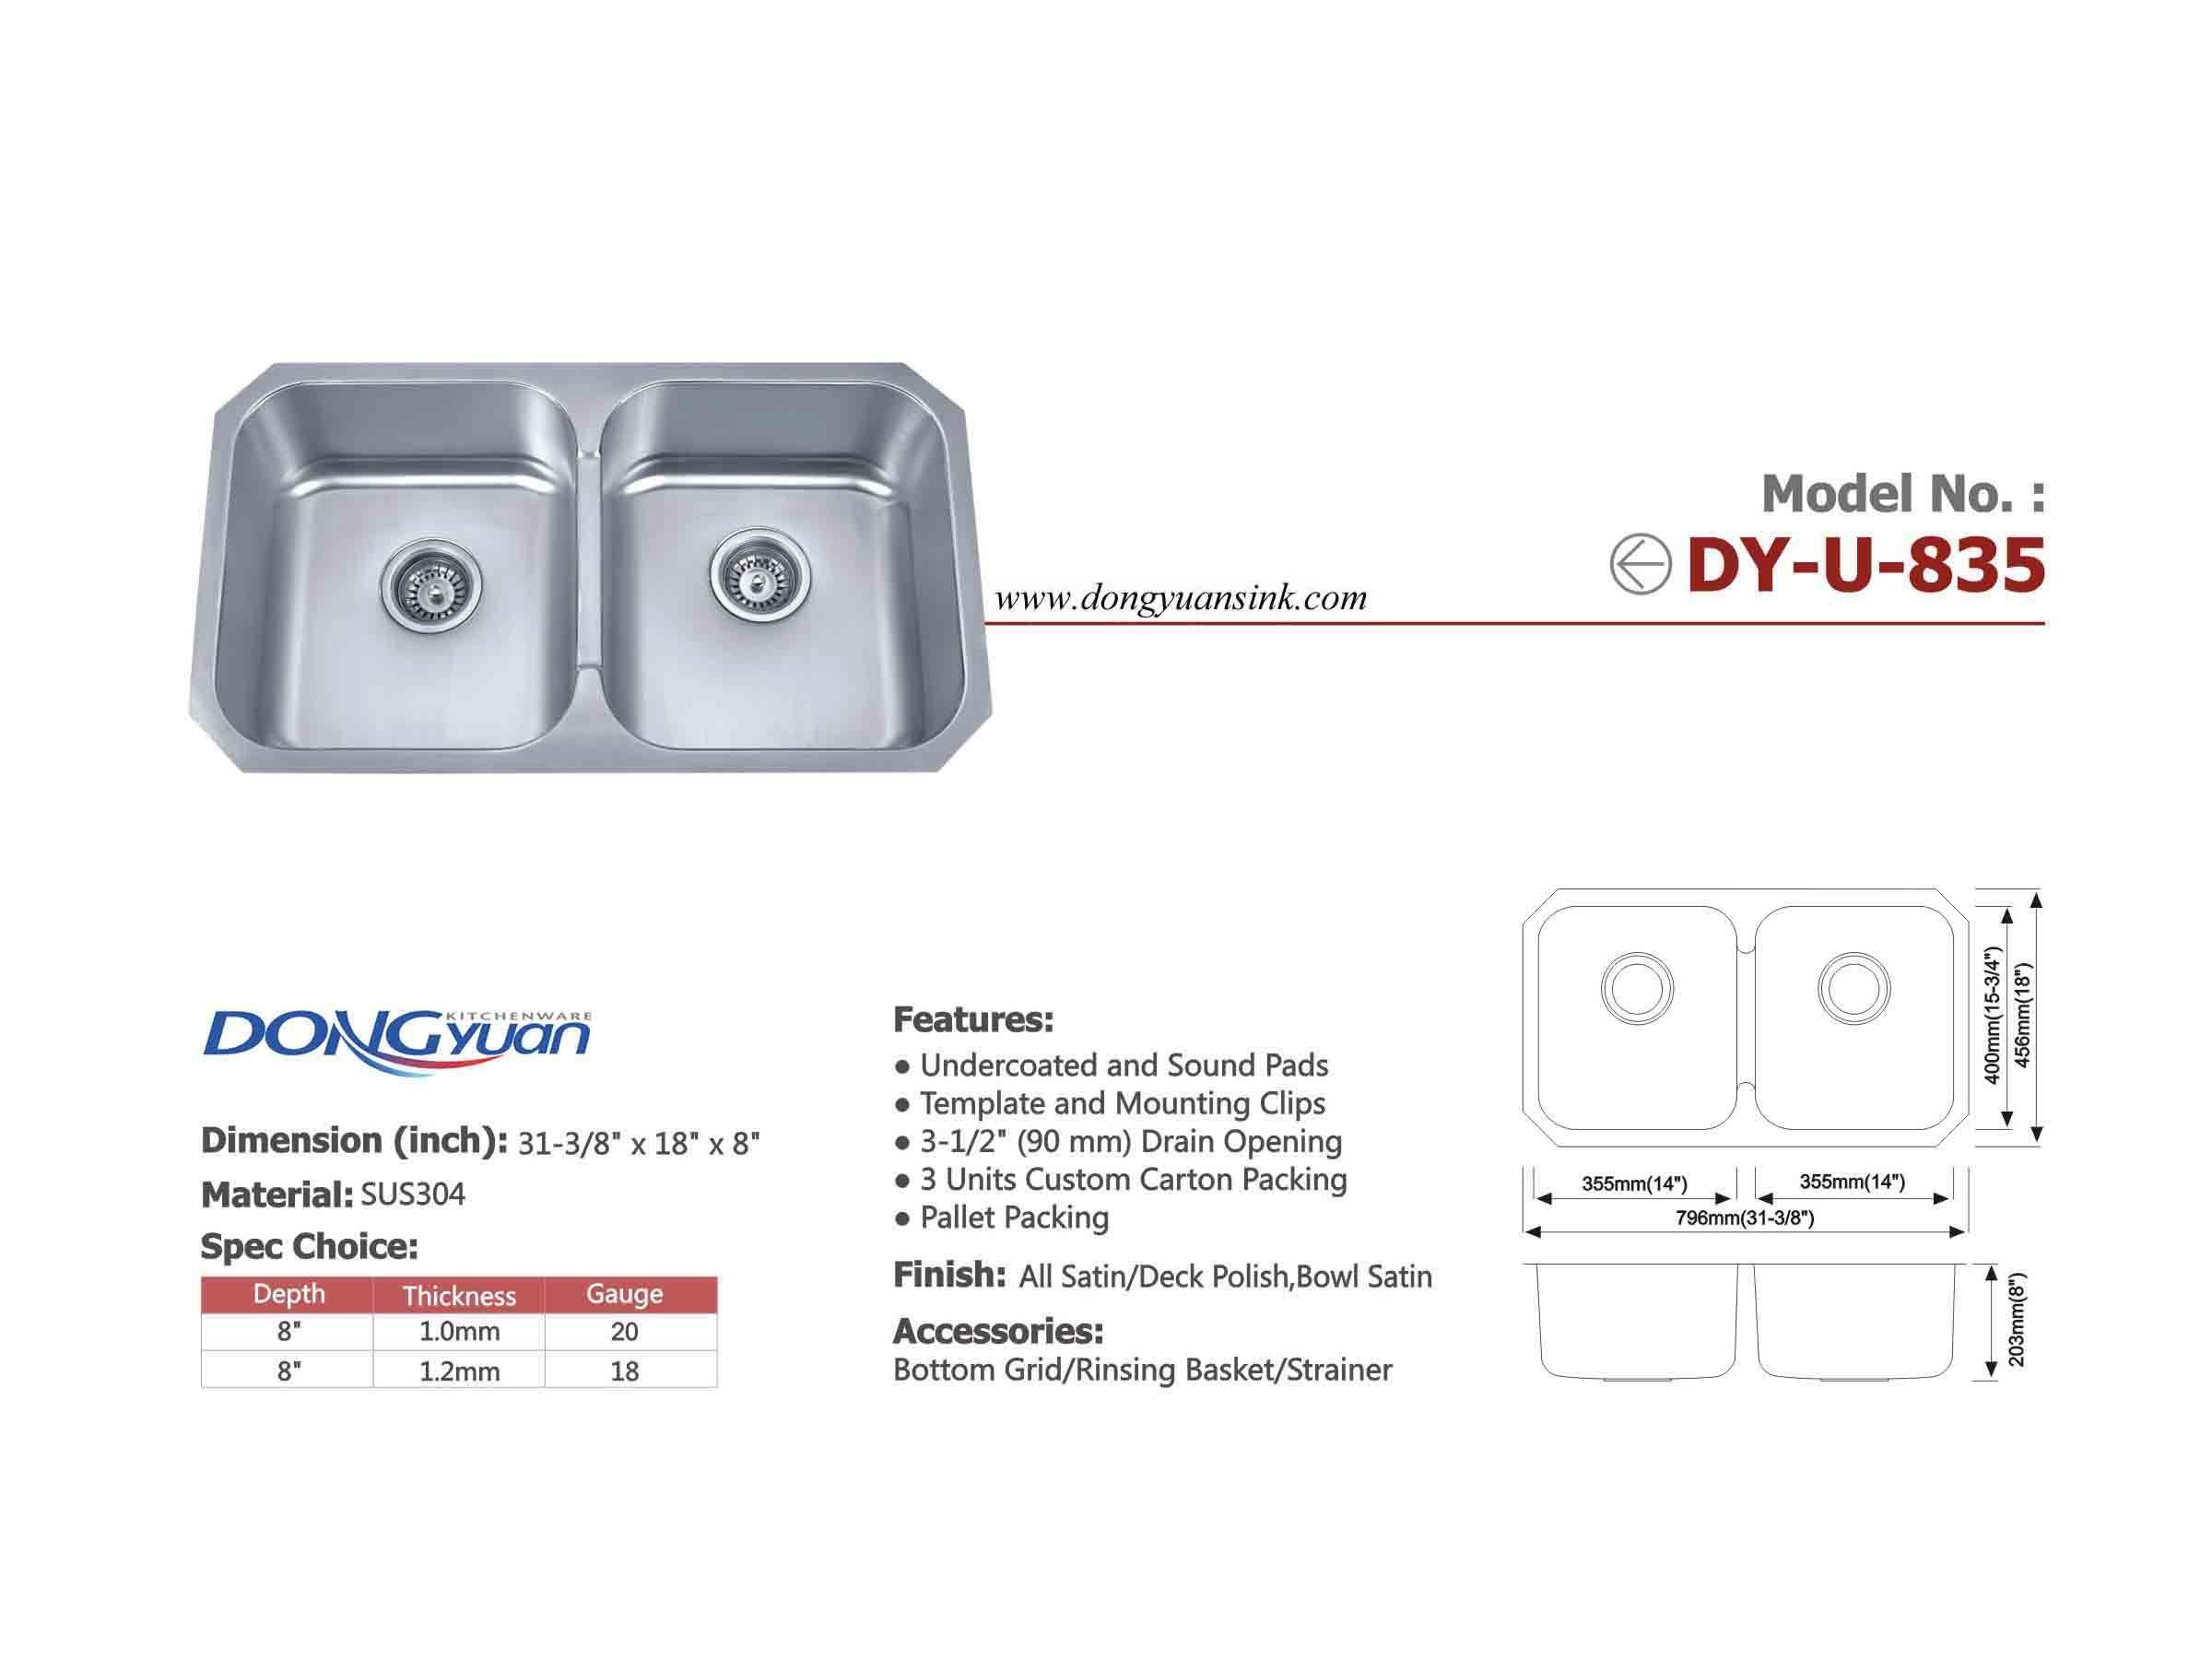 Dongyuan 31 3 8 Inch Undermount Stainless Steel 18 Gauge Double Bowls 50 50 Low Bridge Kitchen Sink Drain Opener Kitchen Sink Undermount Kitchen Sinks